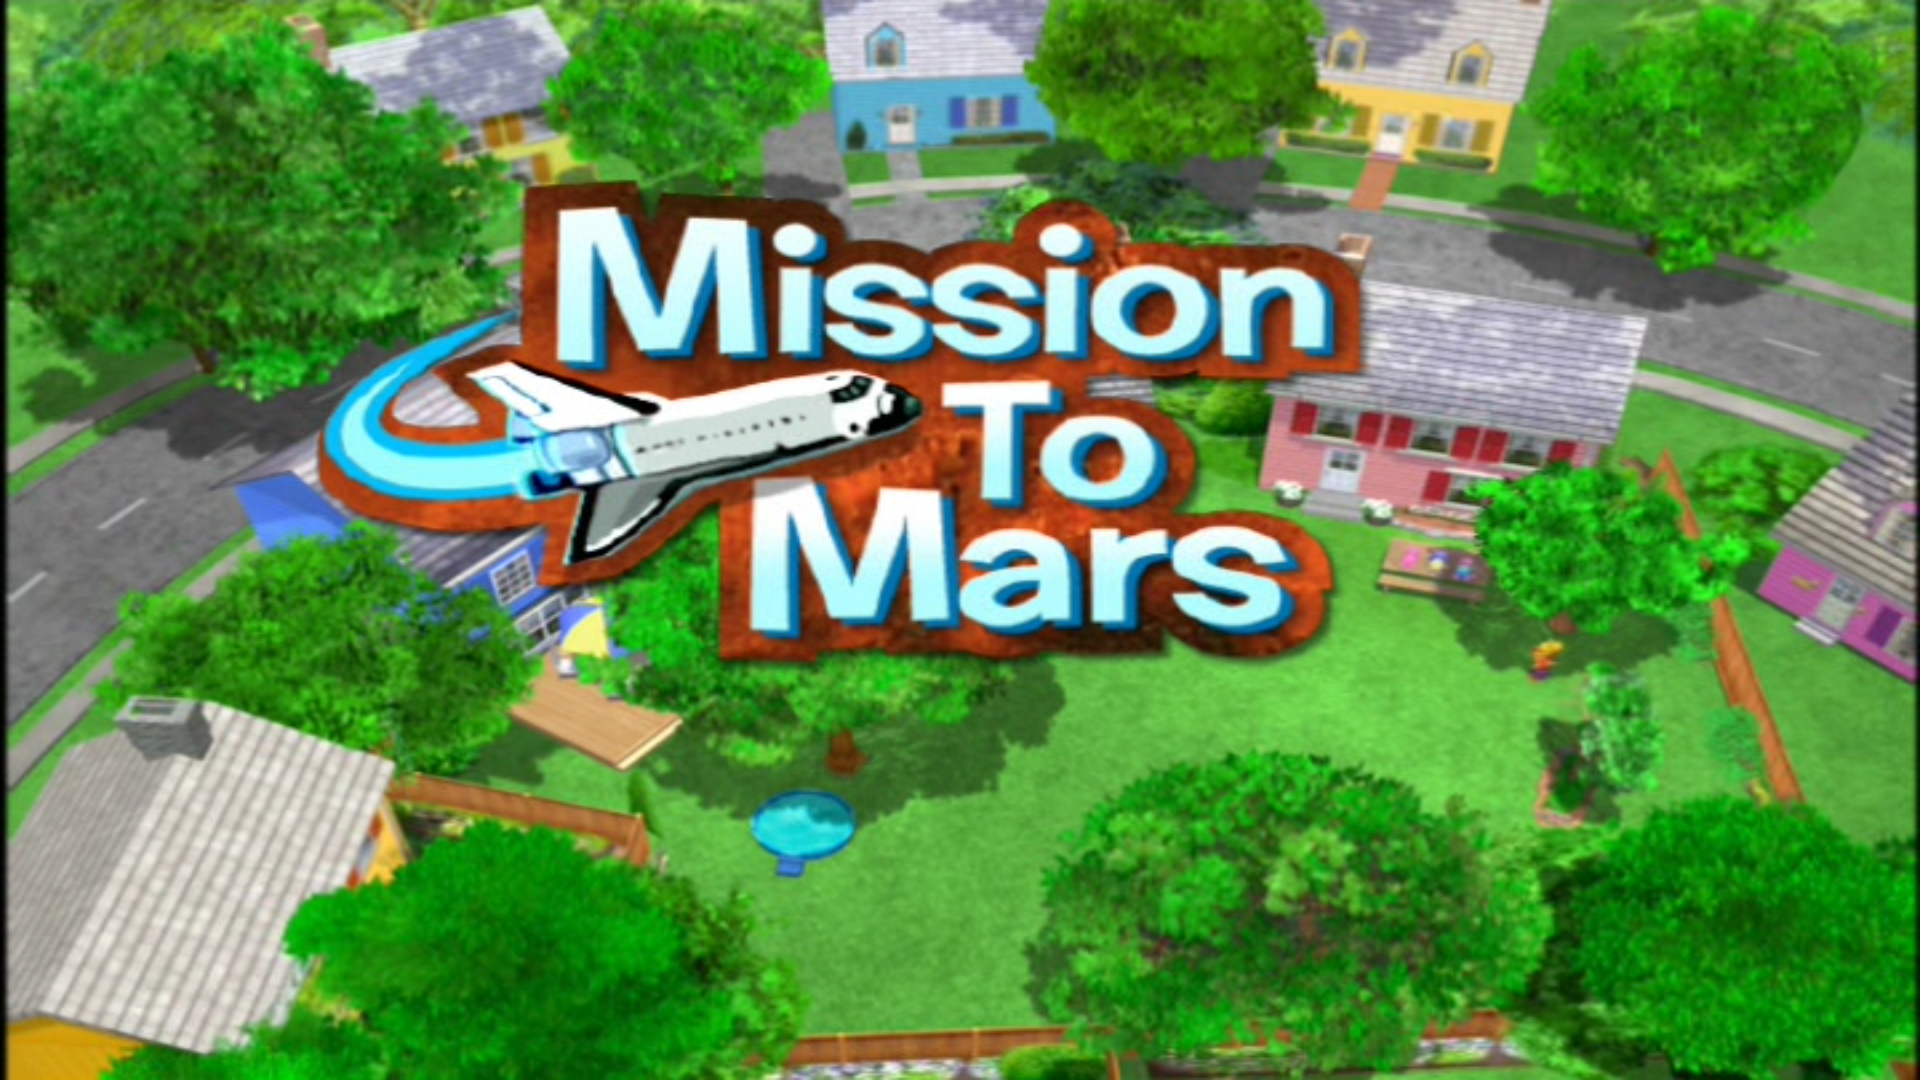 mission to mars movie robot - photo #37